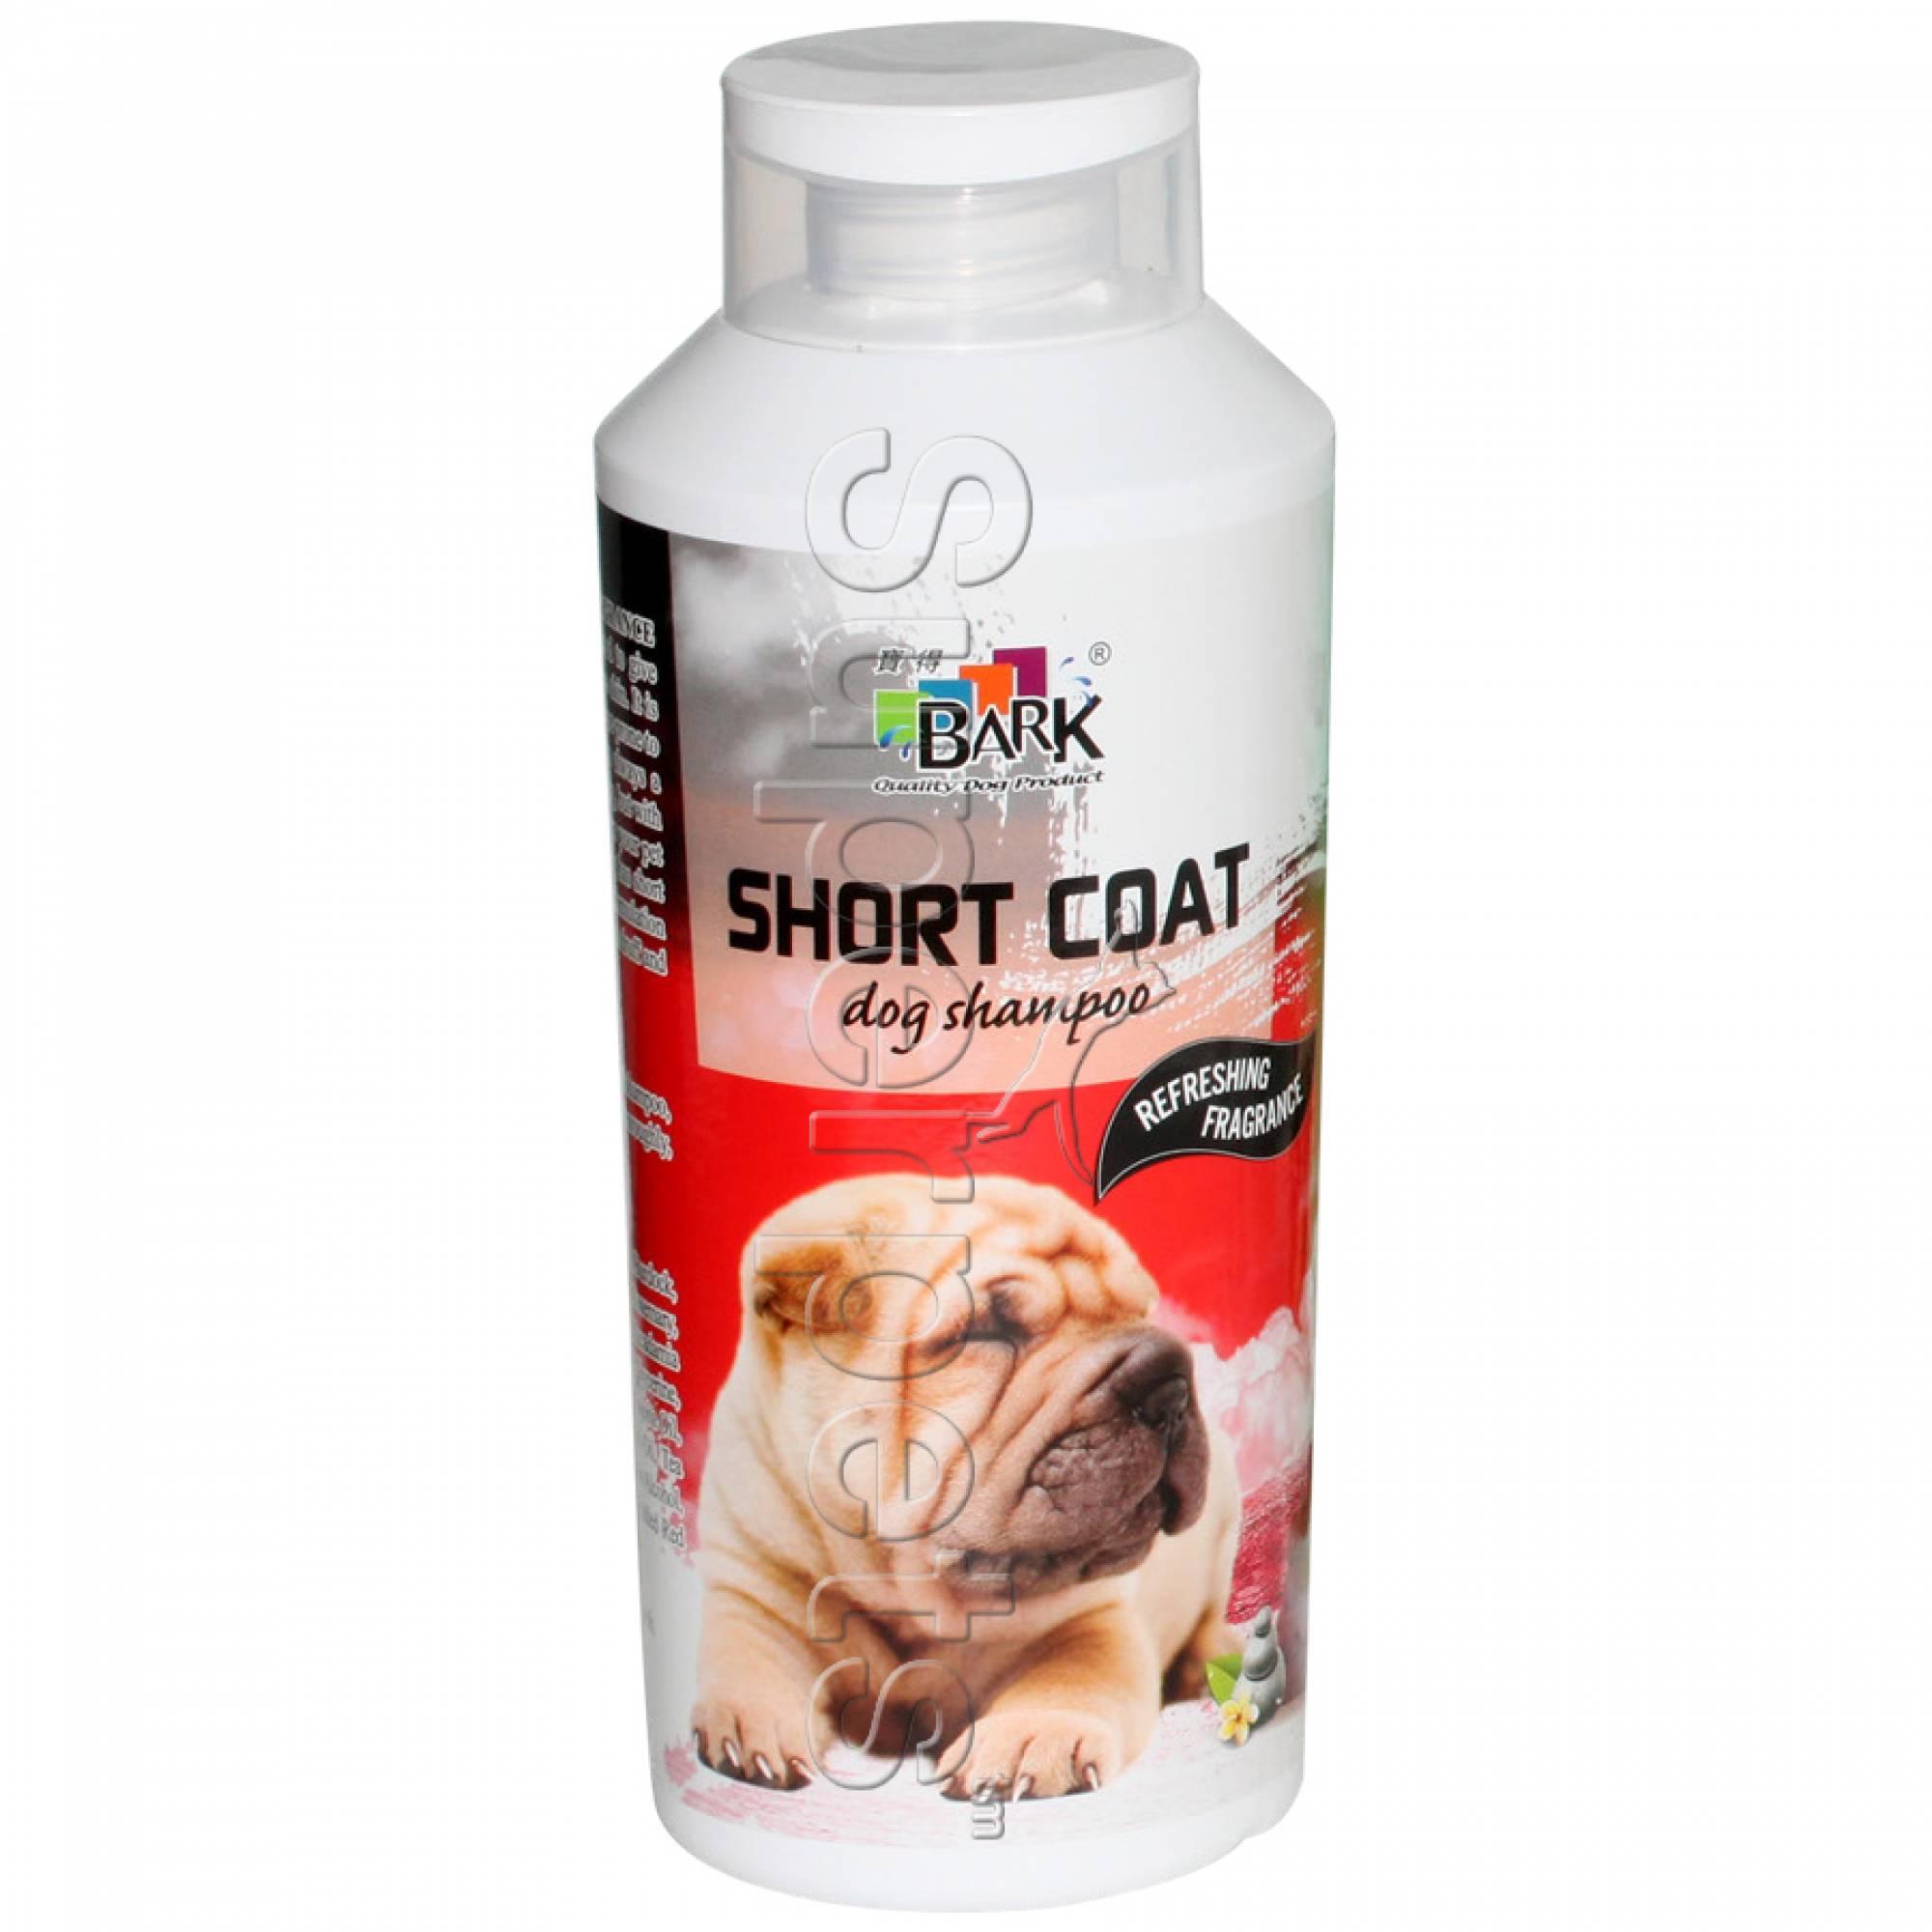 Bark - Dog Shampoo Short Coat 500ml